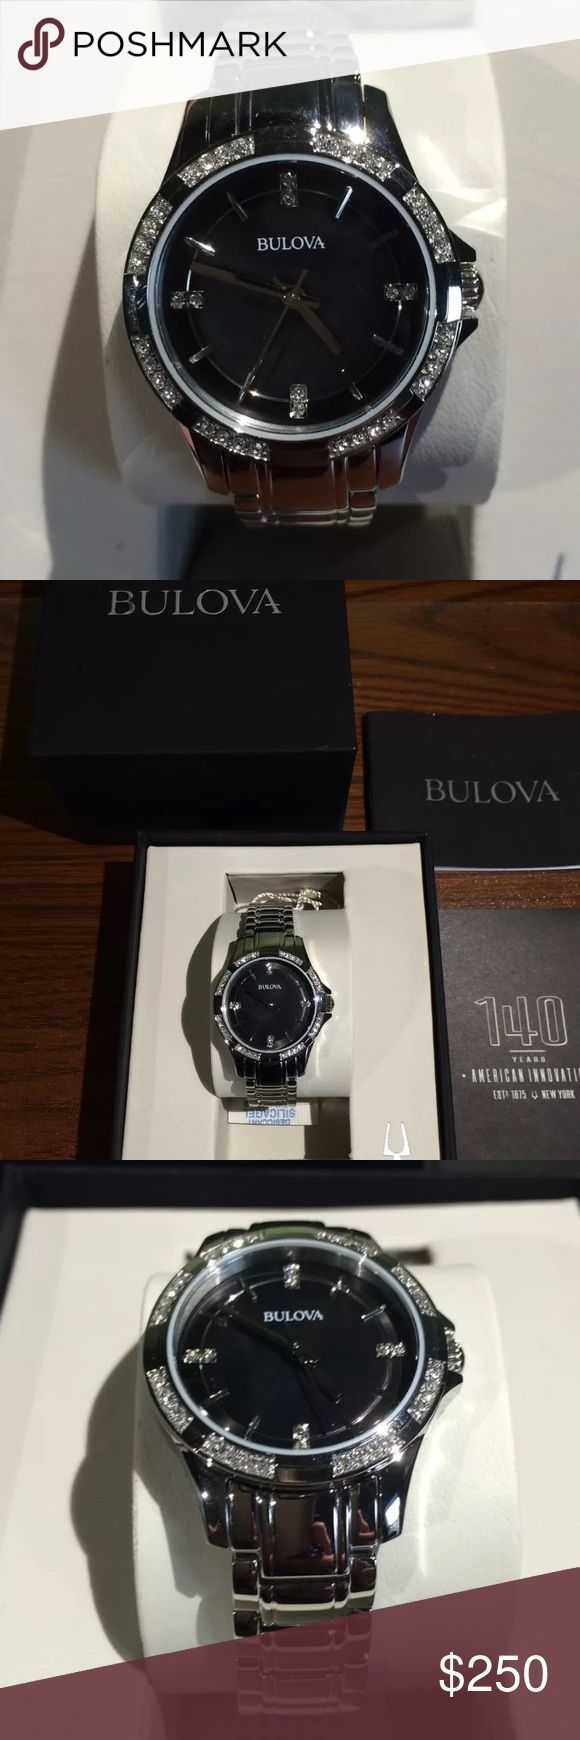 Unisex crystal bulova watch! Brand new! Unisex crystal bulova watch! Brand new in box! Accessories Watches